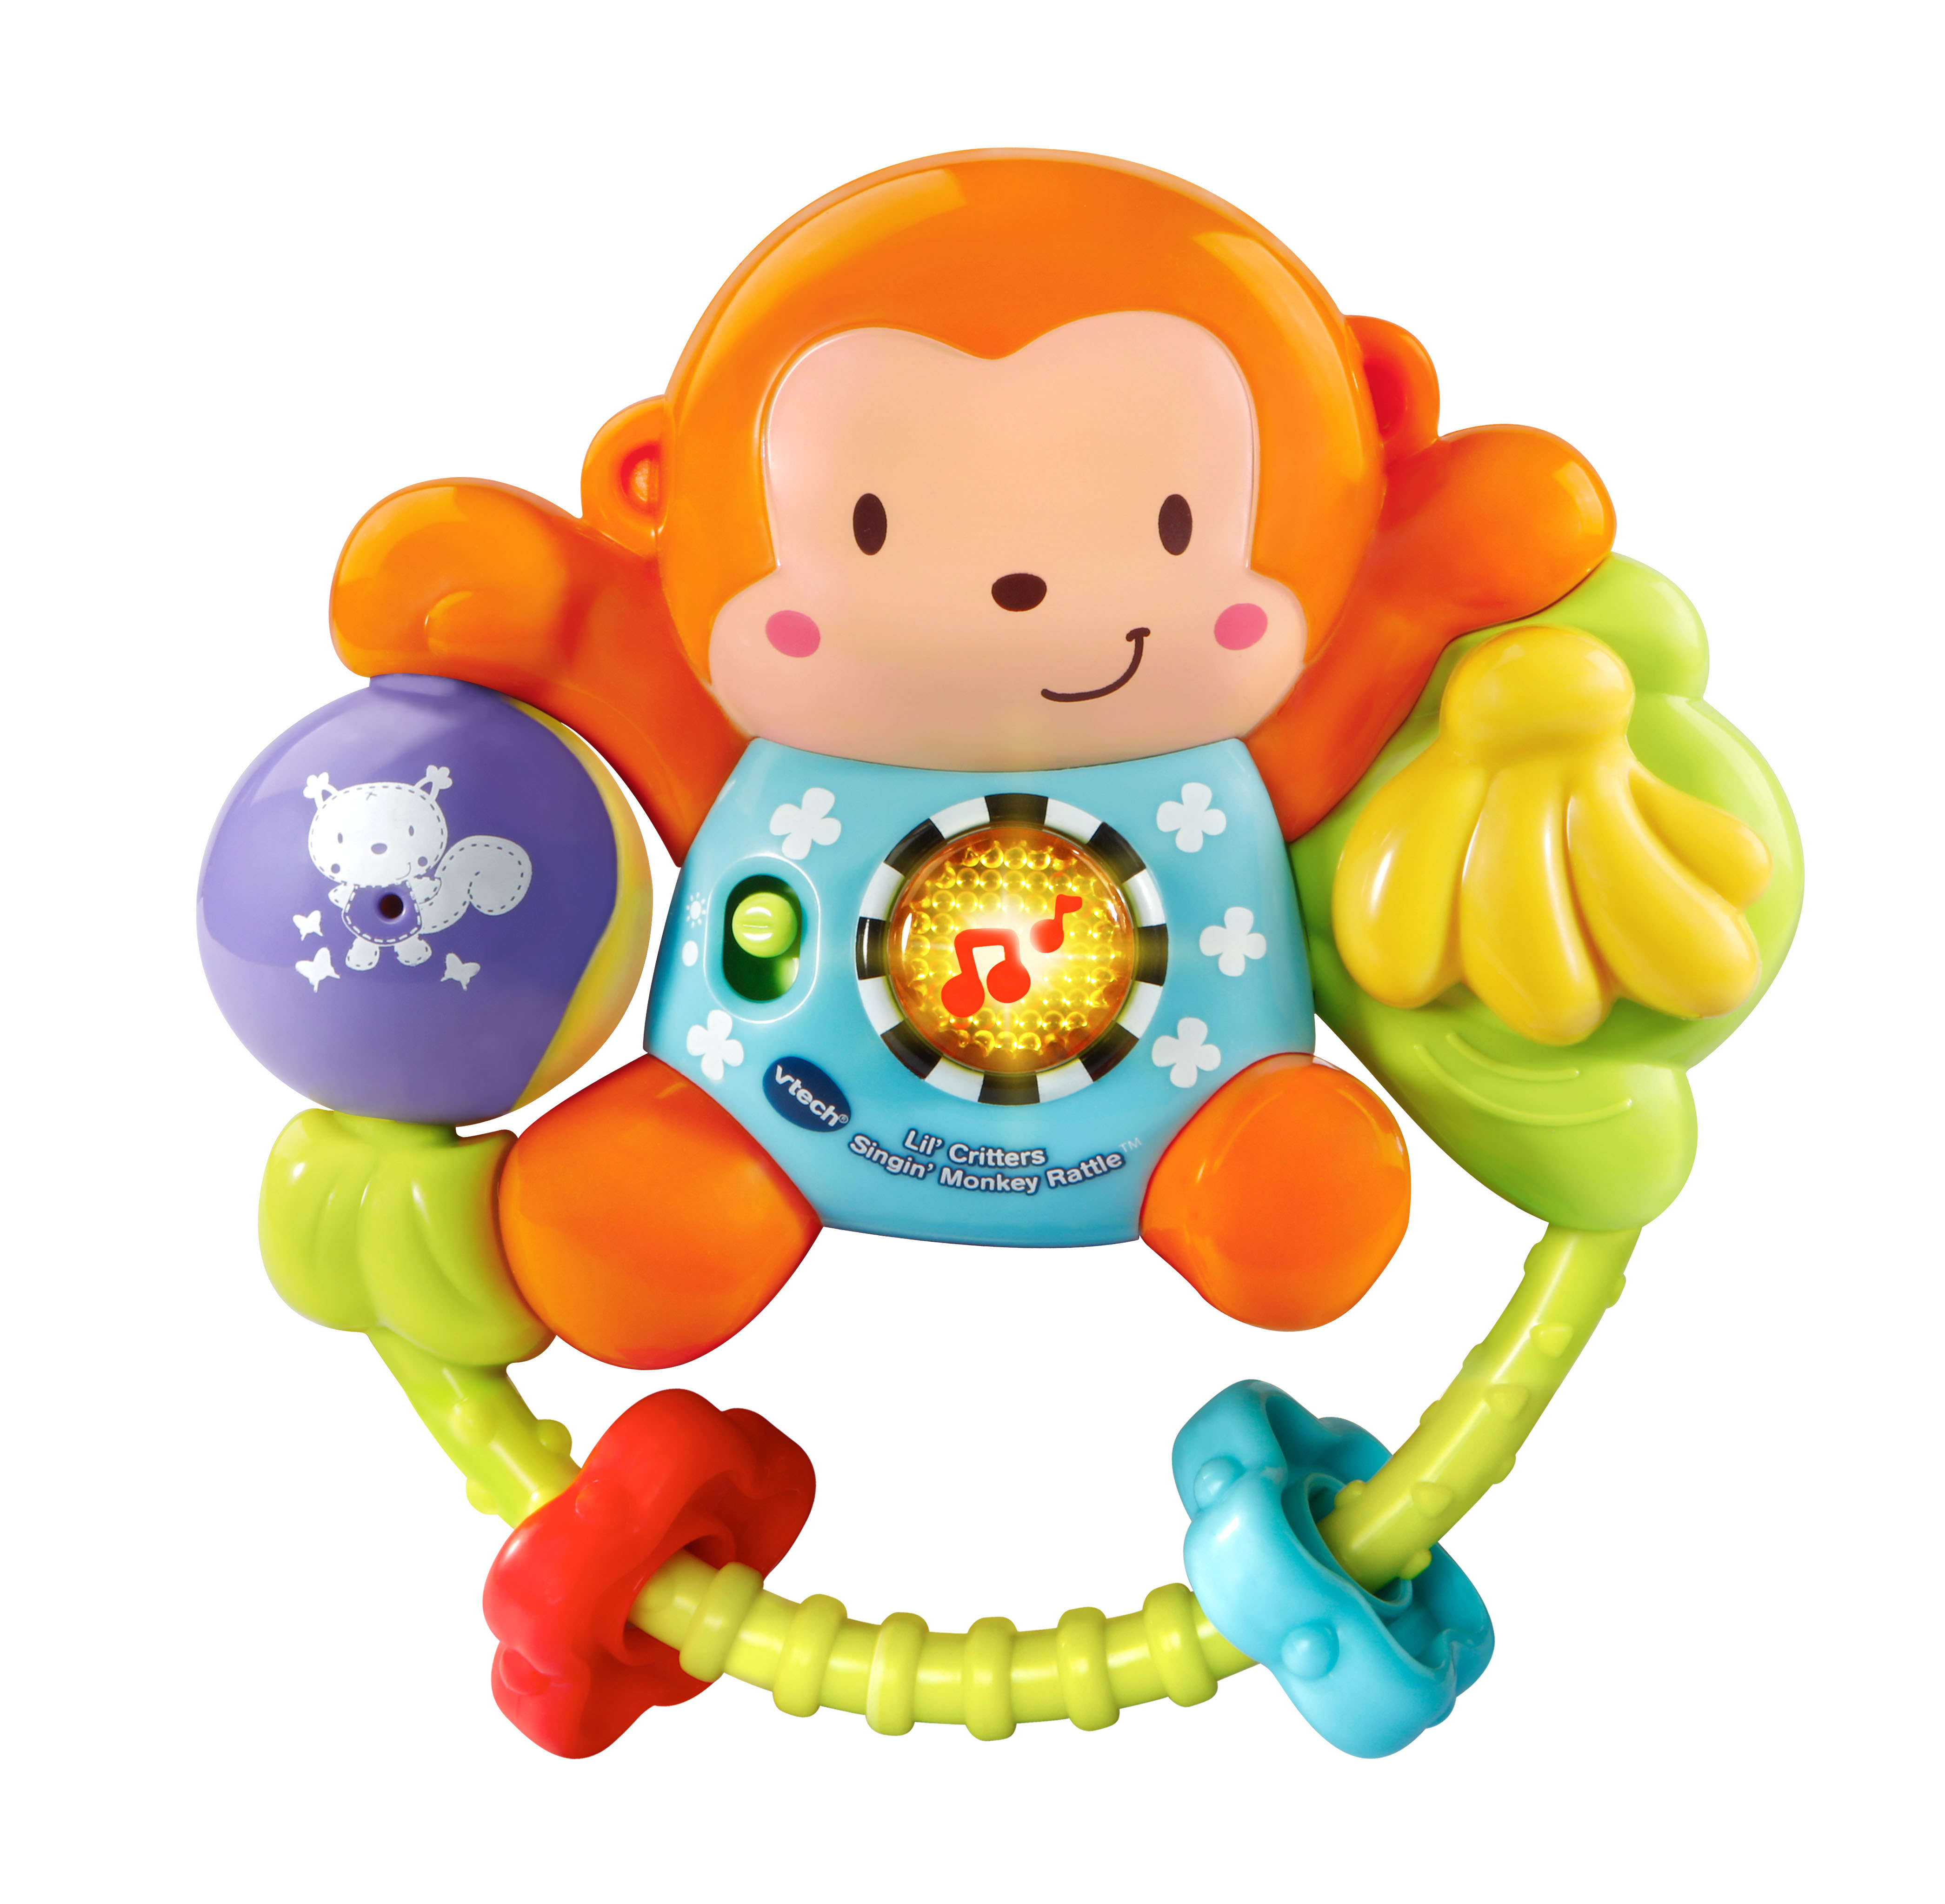 VTech® Lil' Critters Singin' Monkey Rattle™